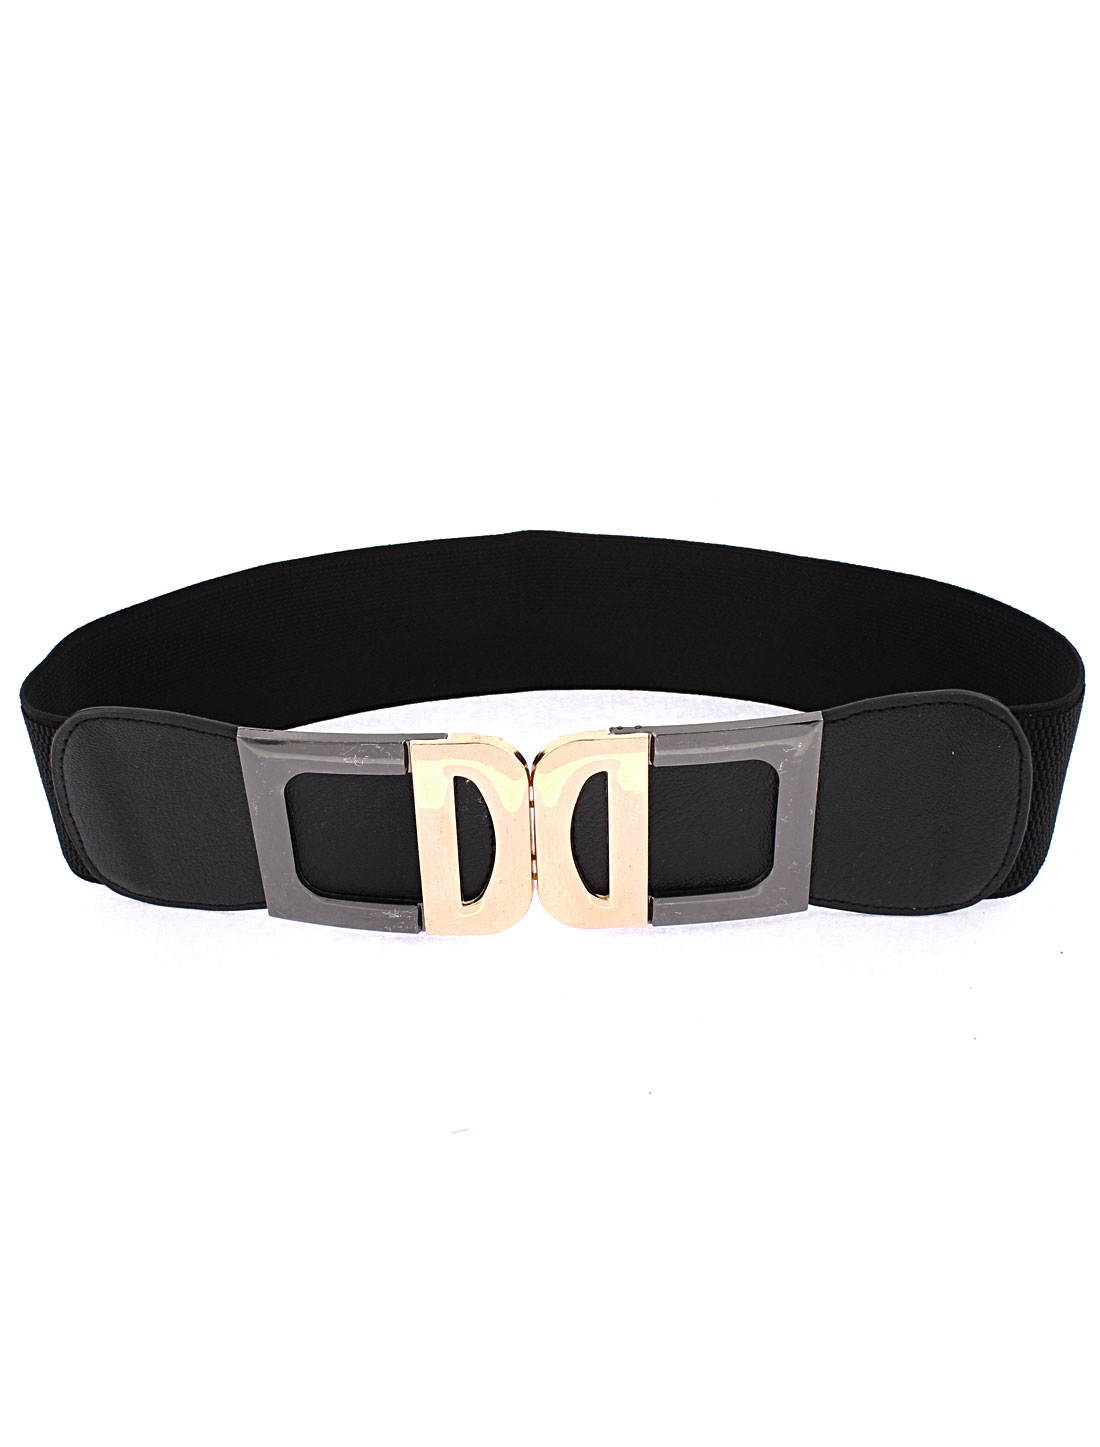 Interlocking Buckle Adjustable Elastic Wide Waistband Waist Belt Black